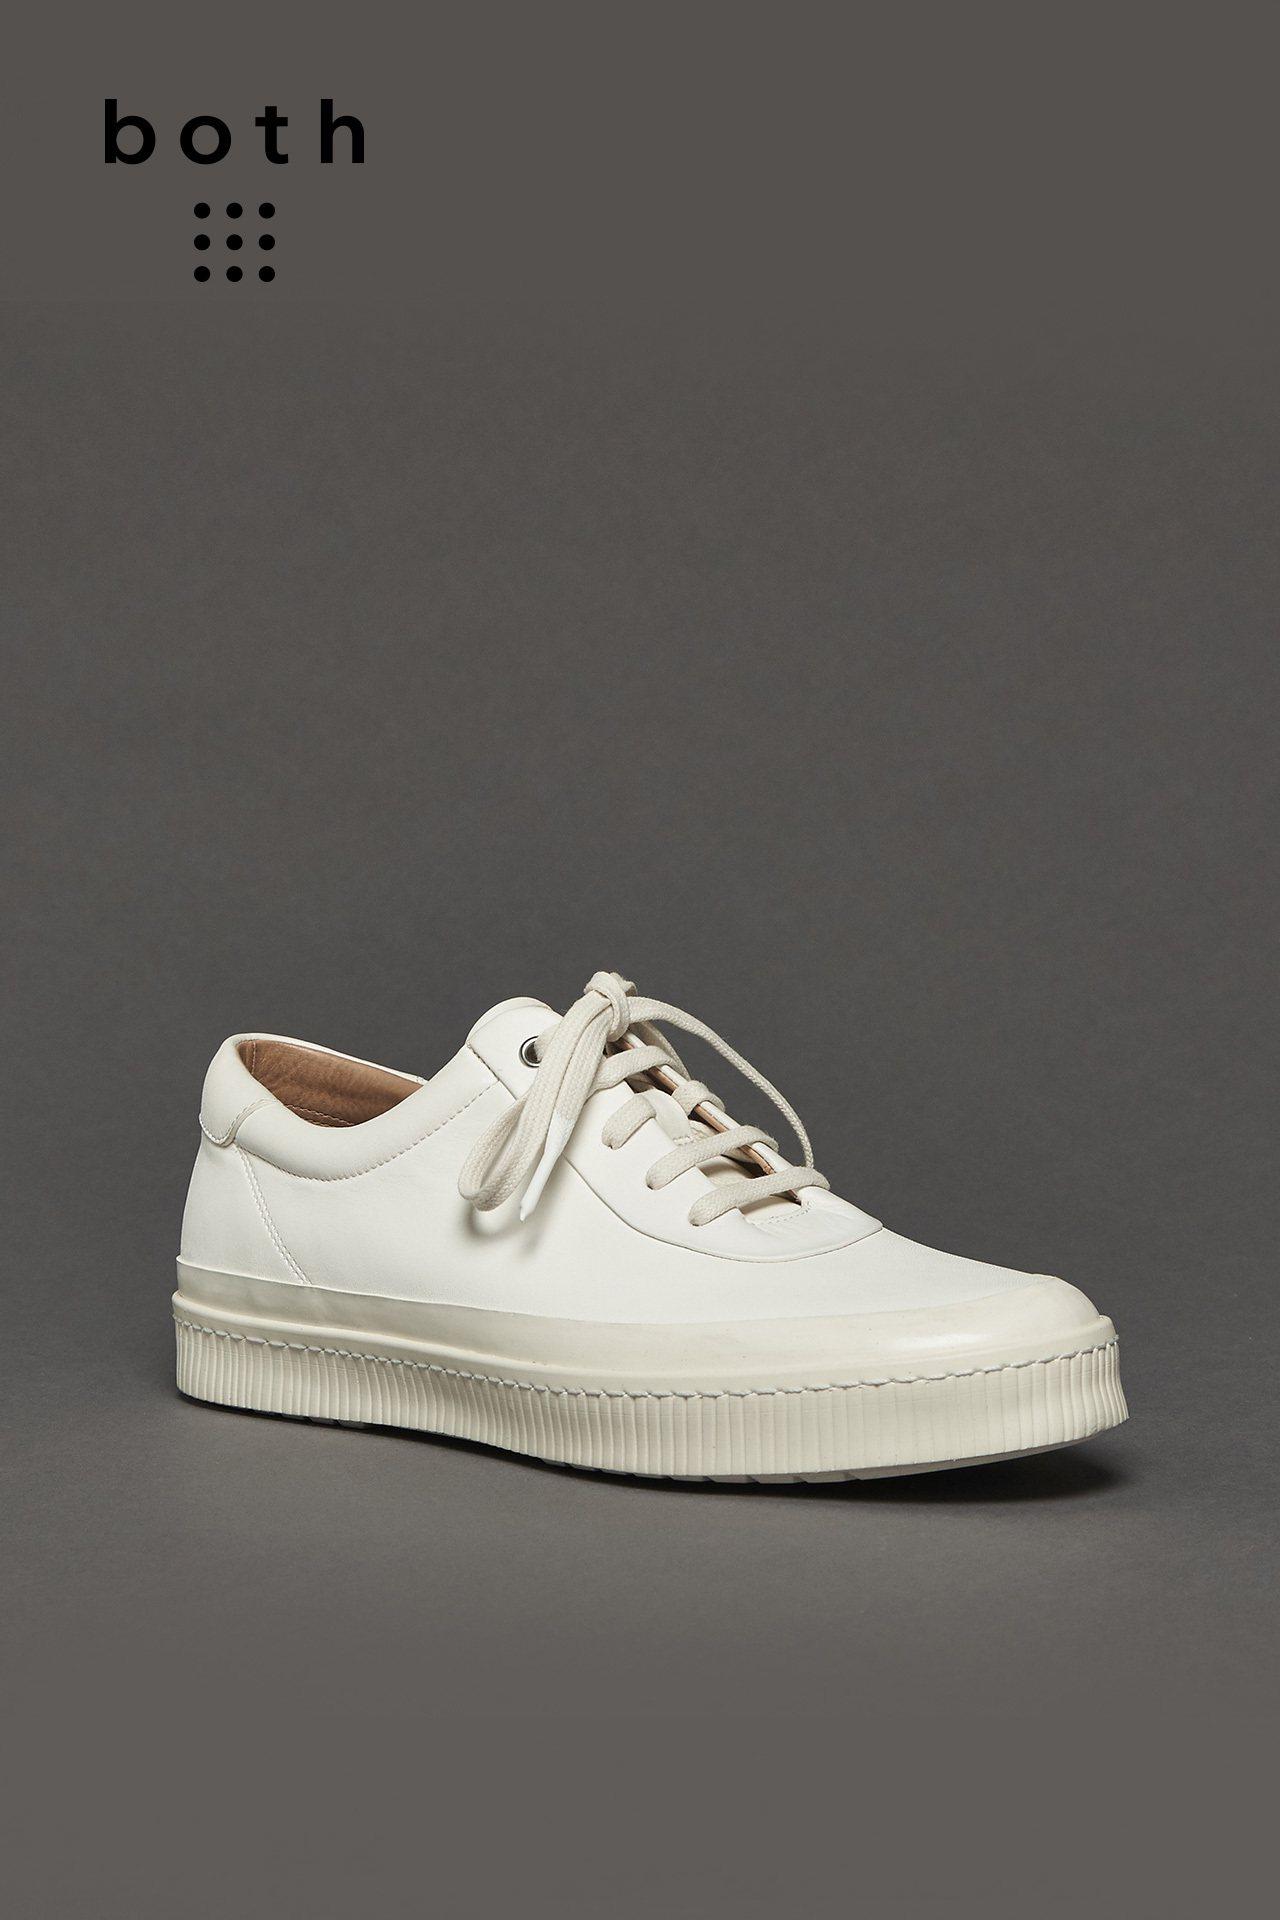 both 白色低筒鞋帶基本款(Artifacts),NT$13,980